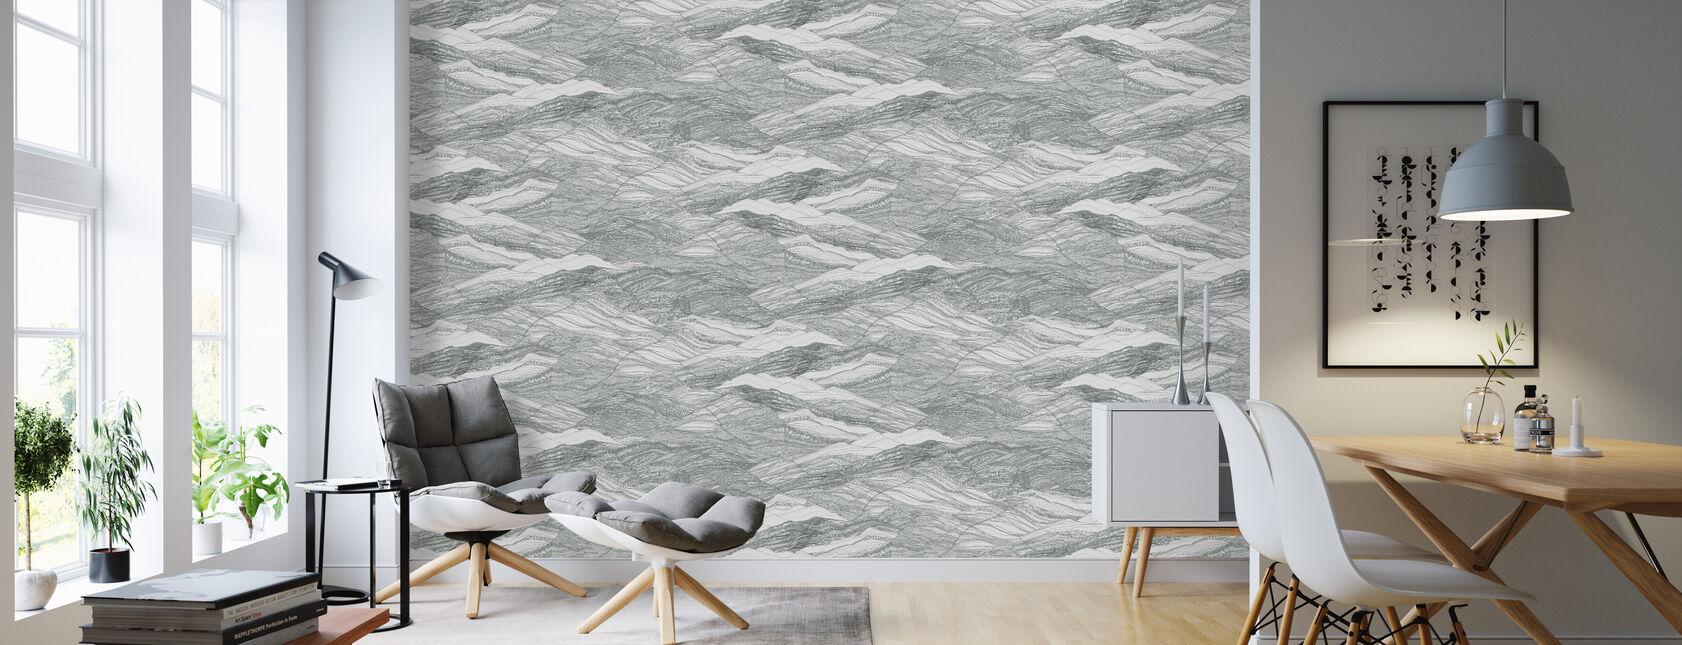 Duna Cactus - Wallpaper - Living Room